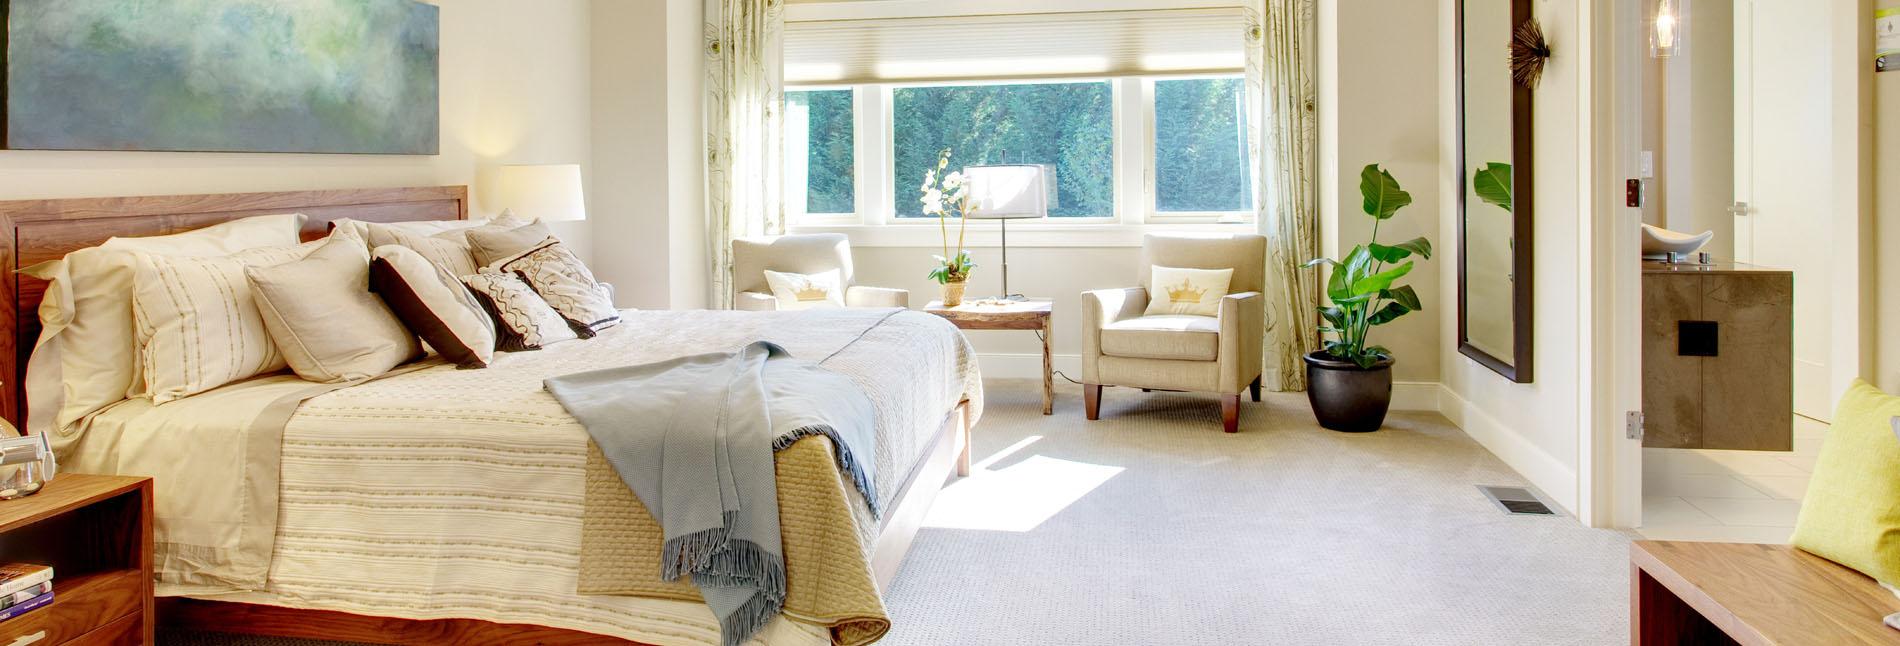 Dise o de interiores en sevilla decoraci n di chi for Diseno de interiores sevilla